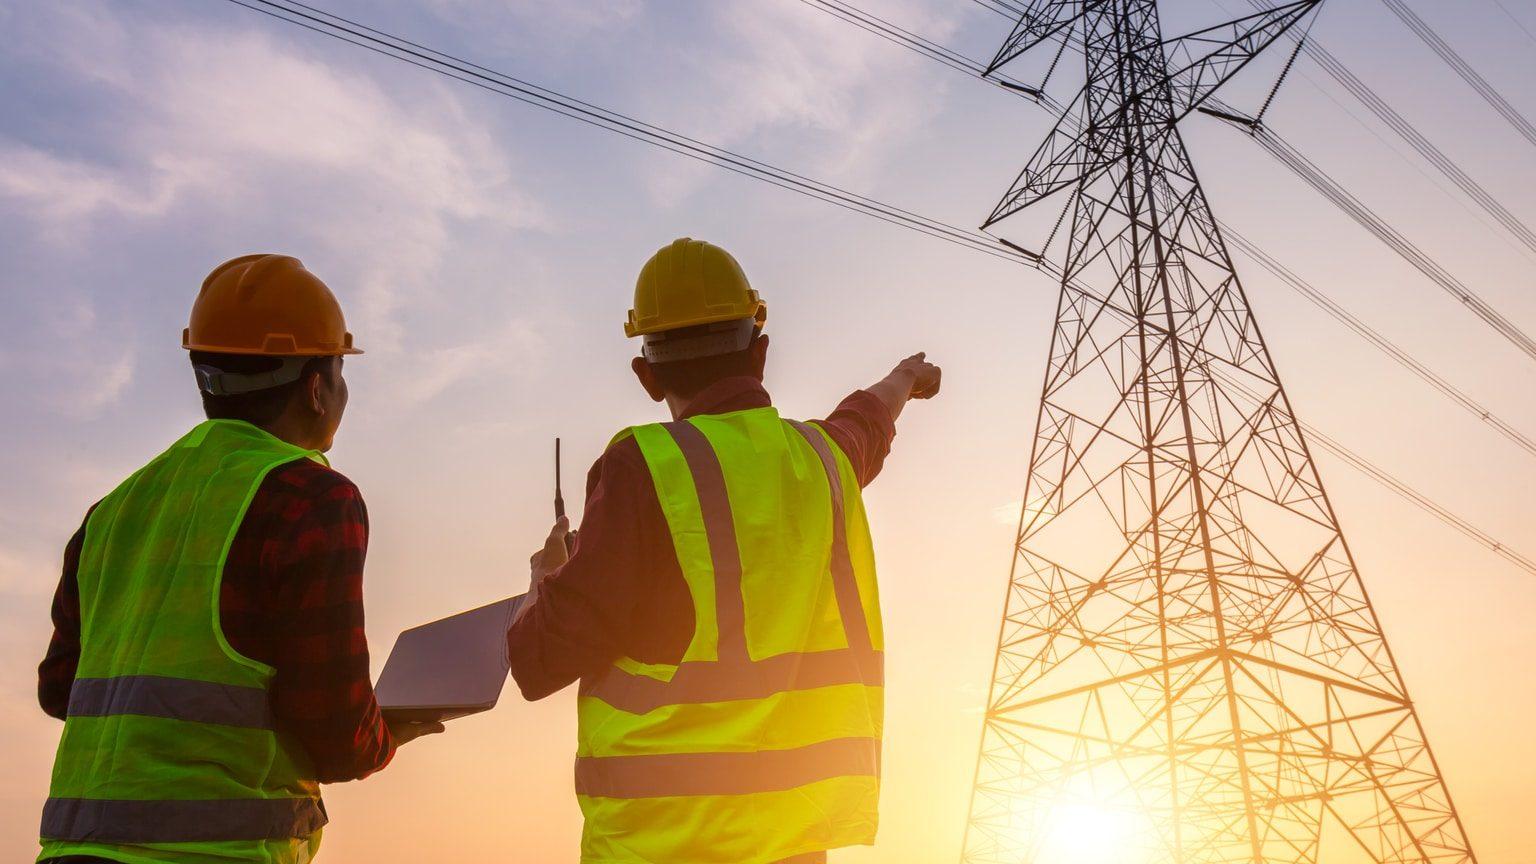 Utilities workers looking at electrical towers